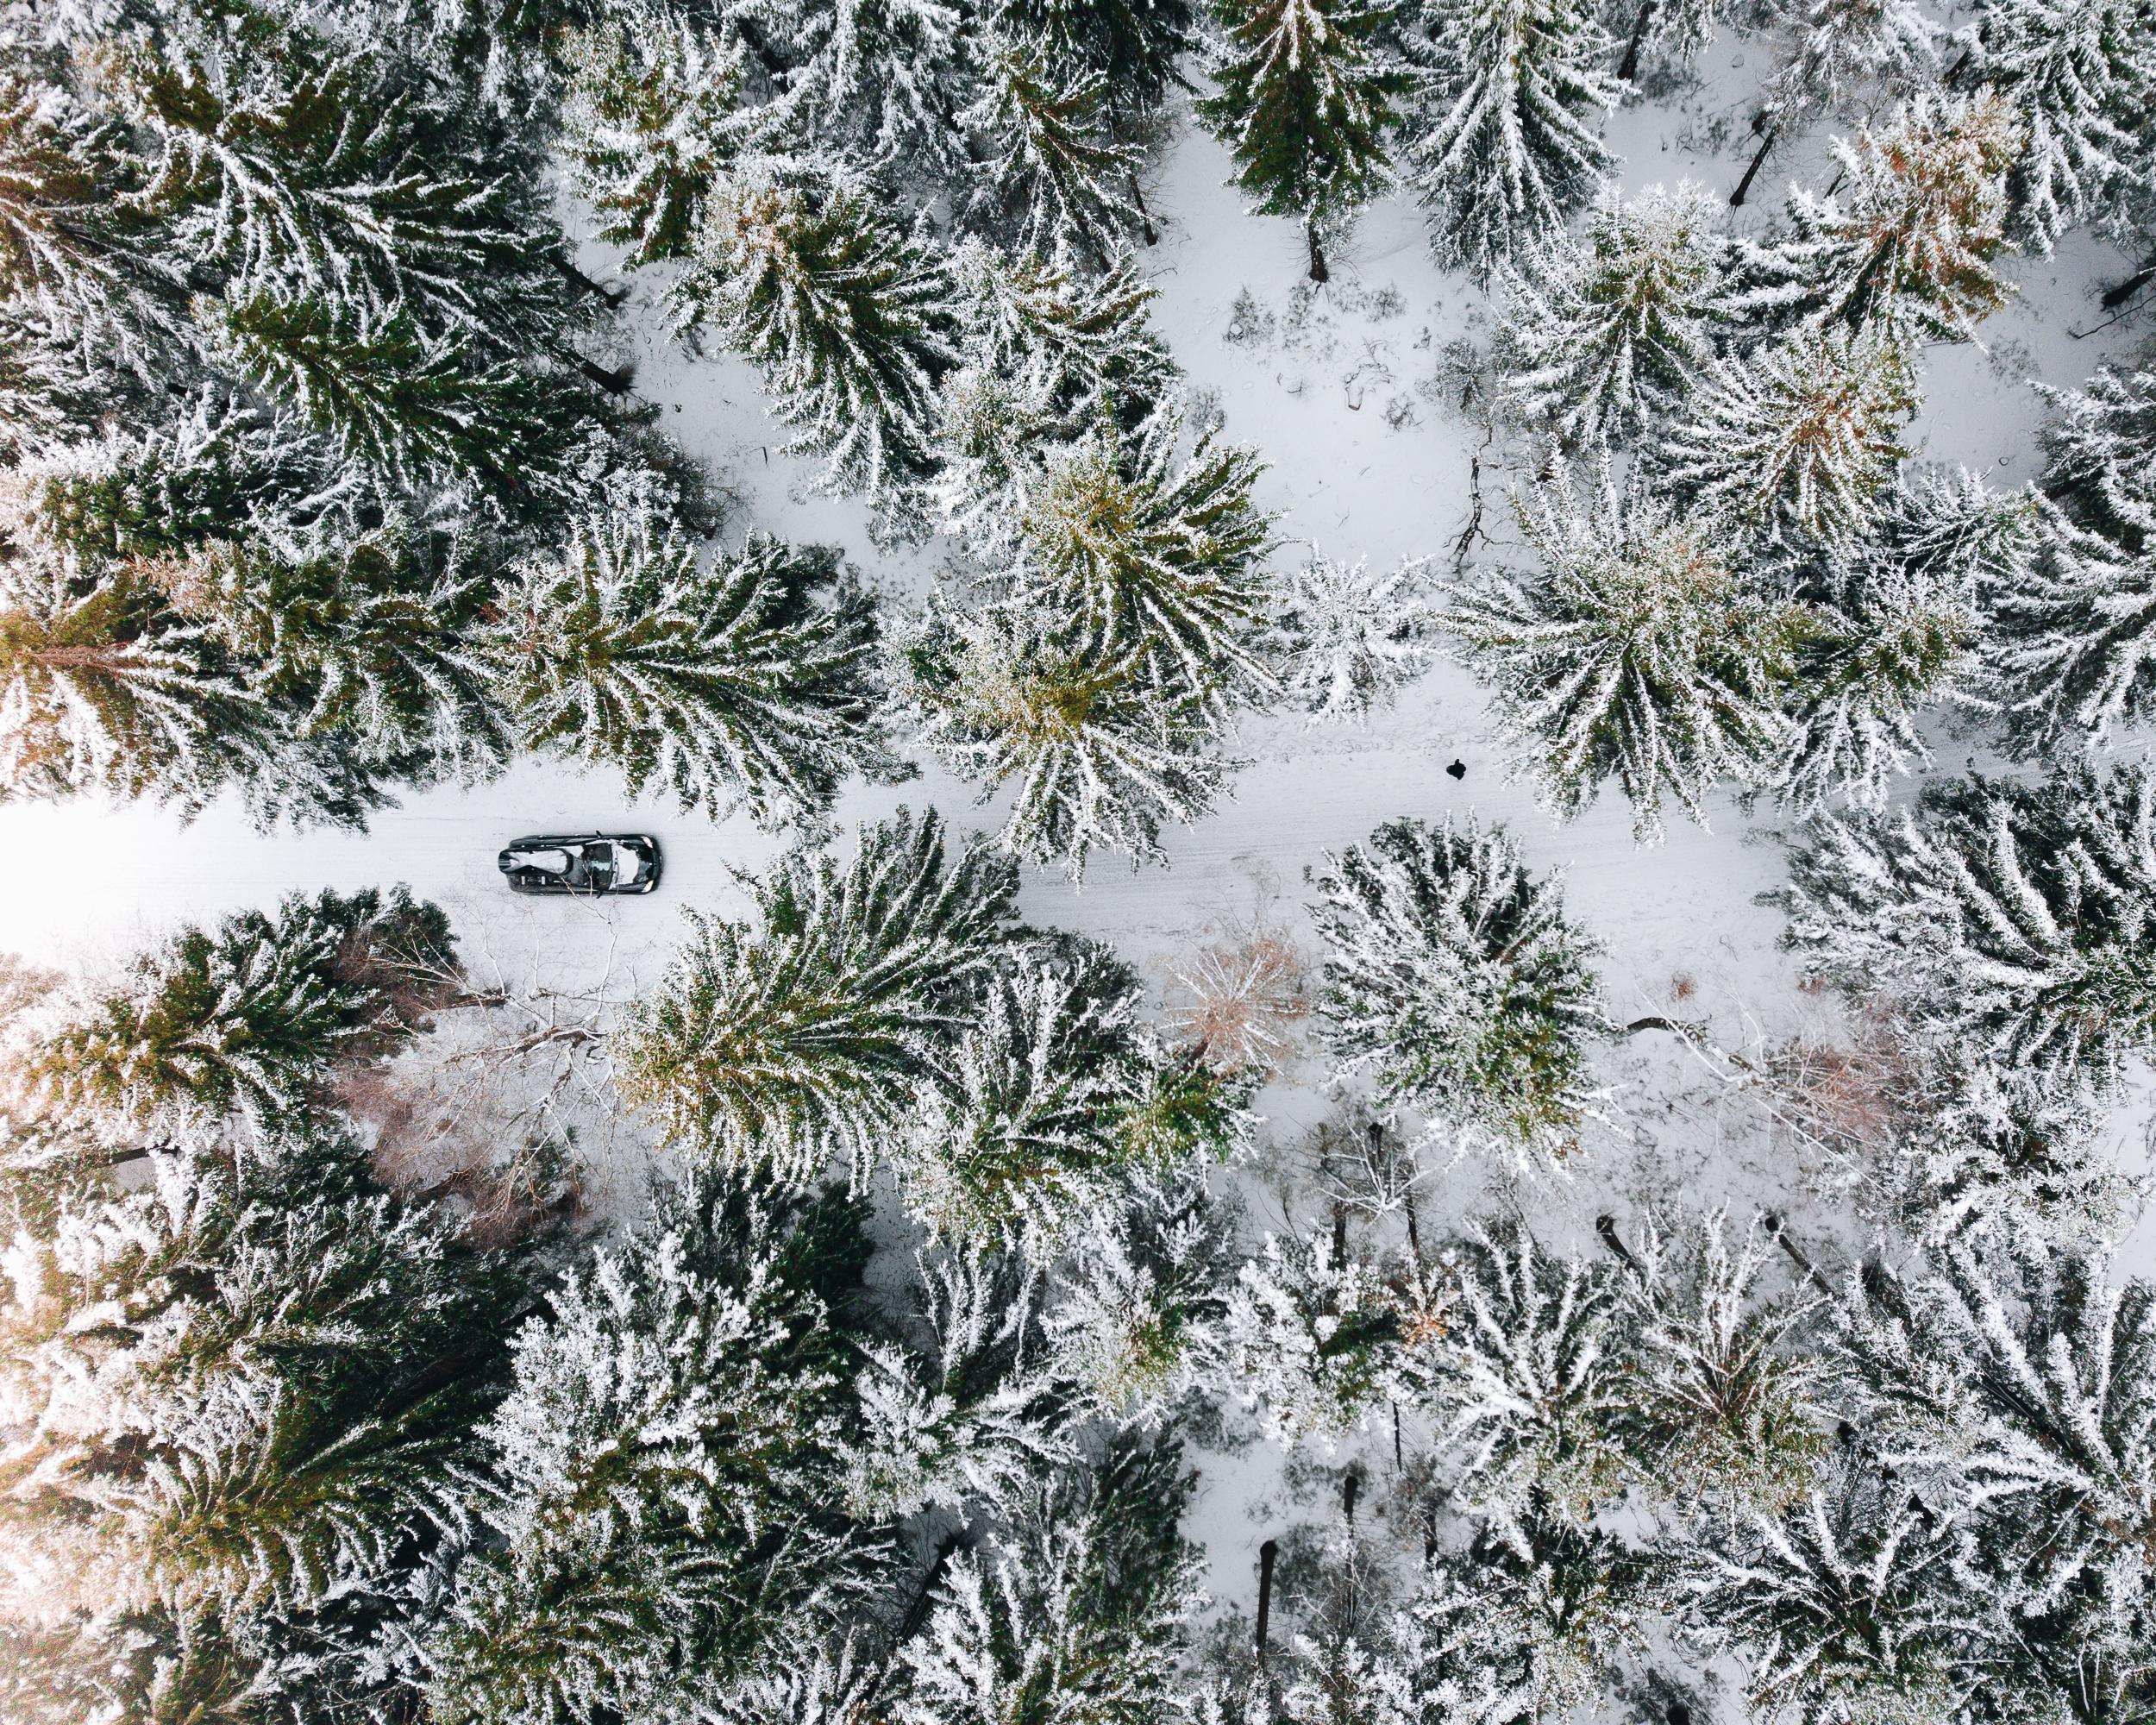 Víkend v Jizerkách: Jablonec, Liberec a trochu hor